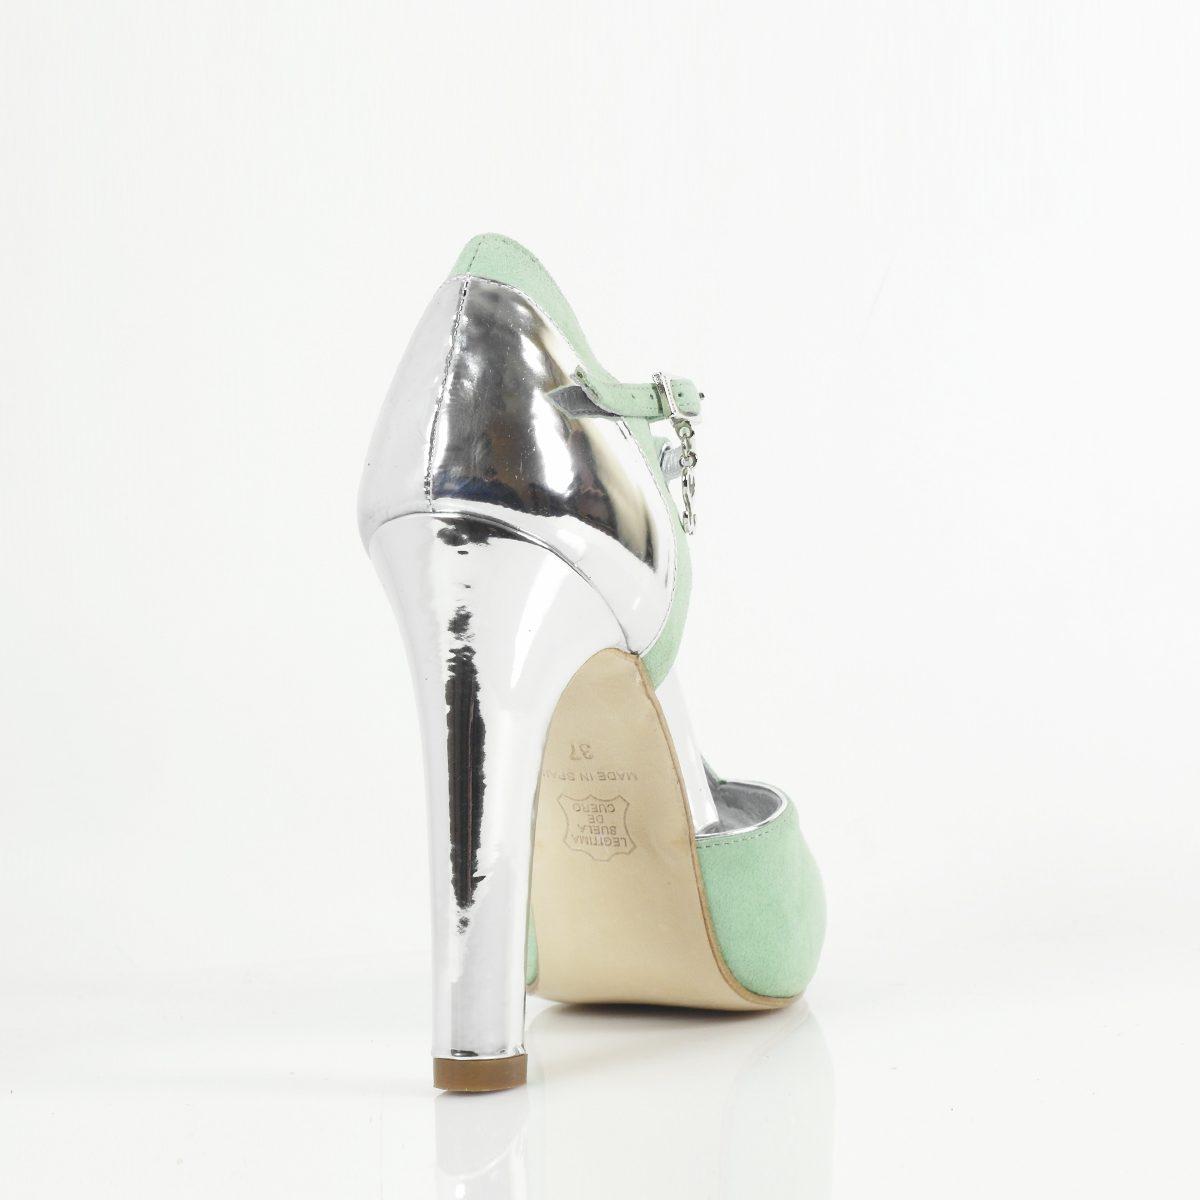 SANDALIA MOD.1960 (10,5cm) - Zapatos Personalizados Fiesta